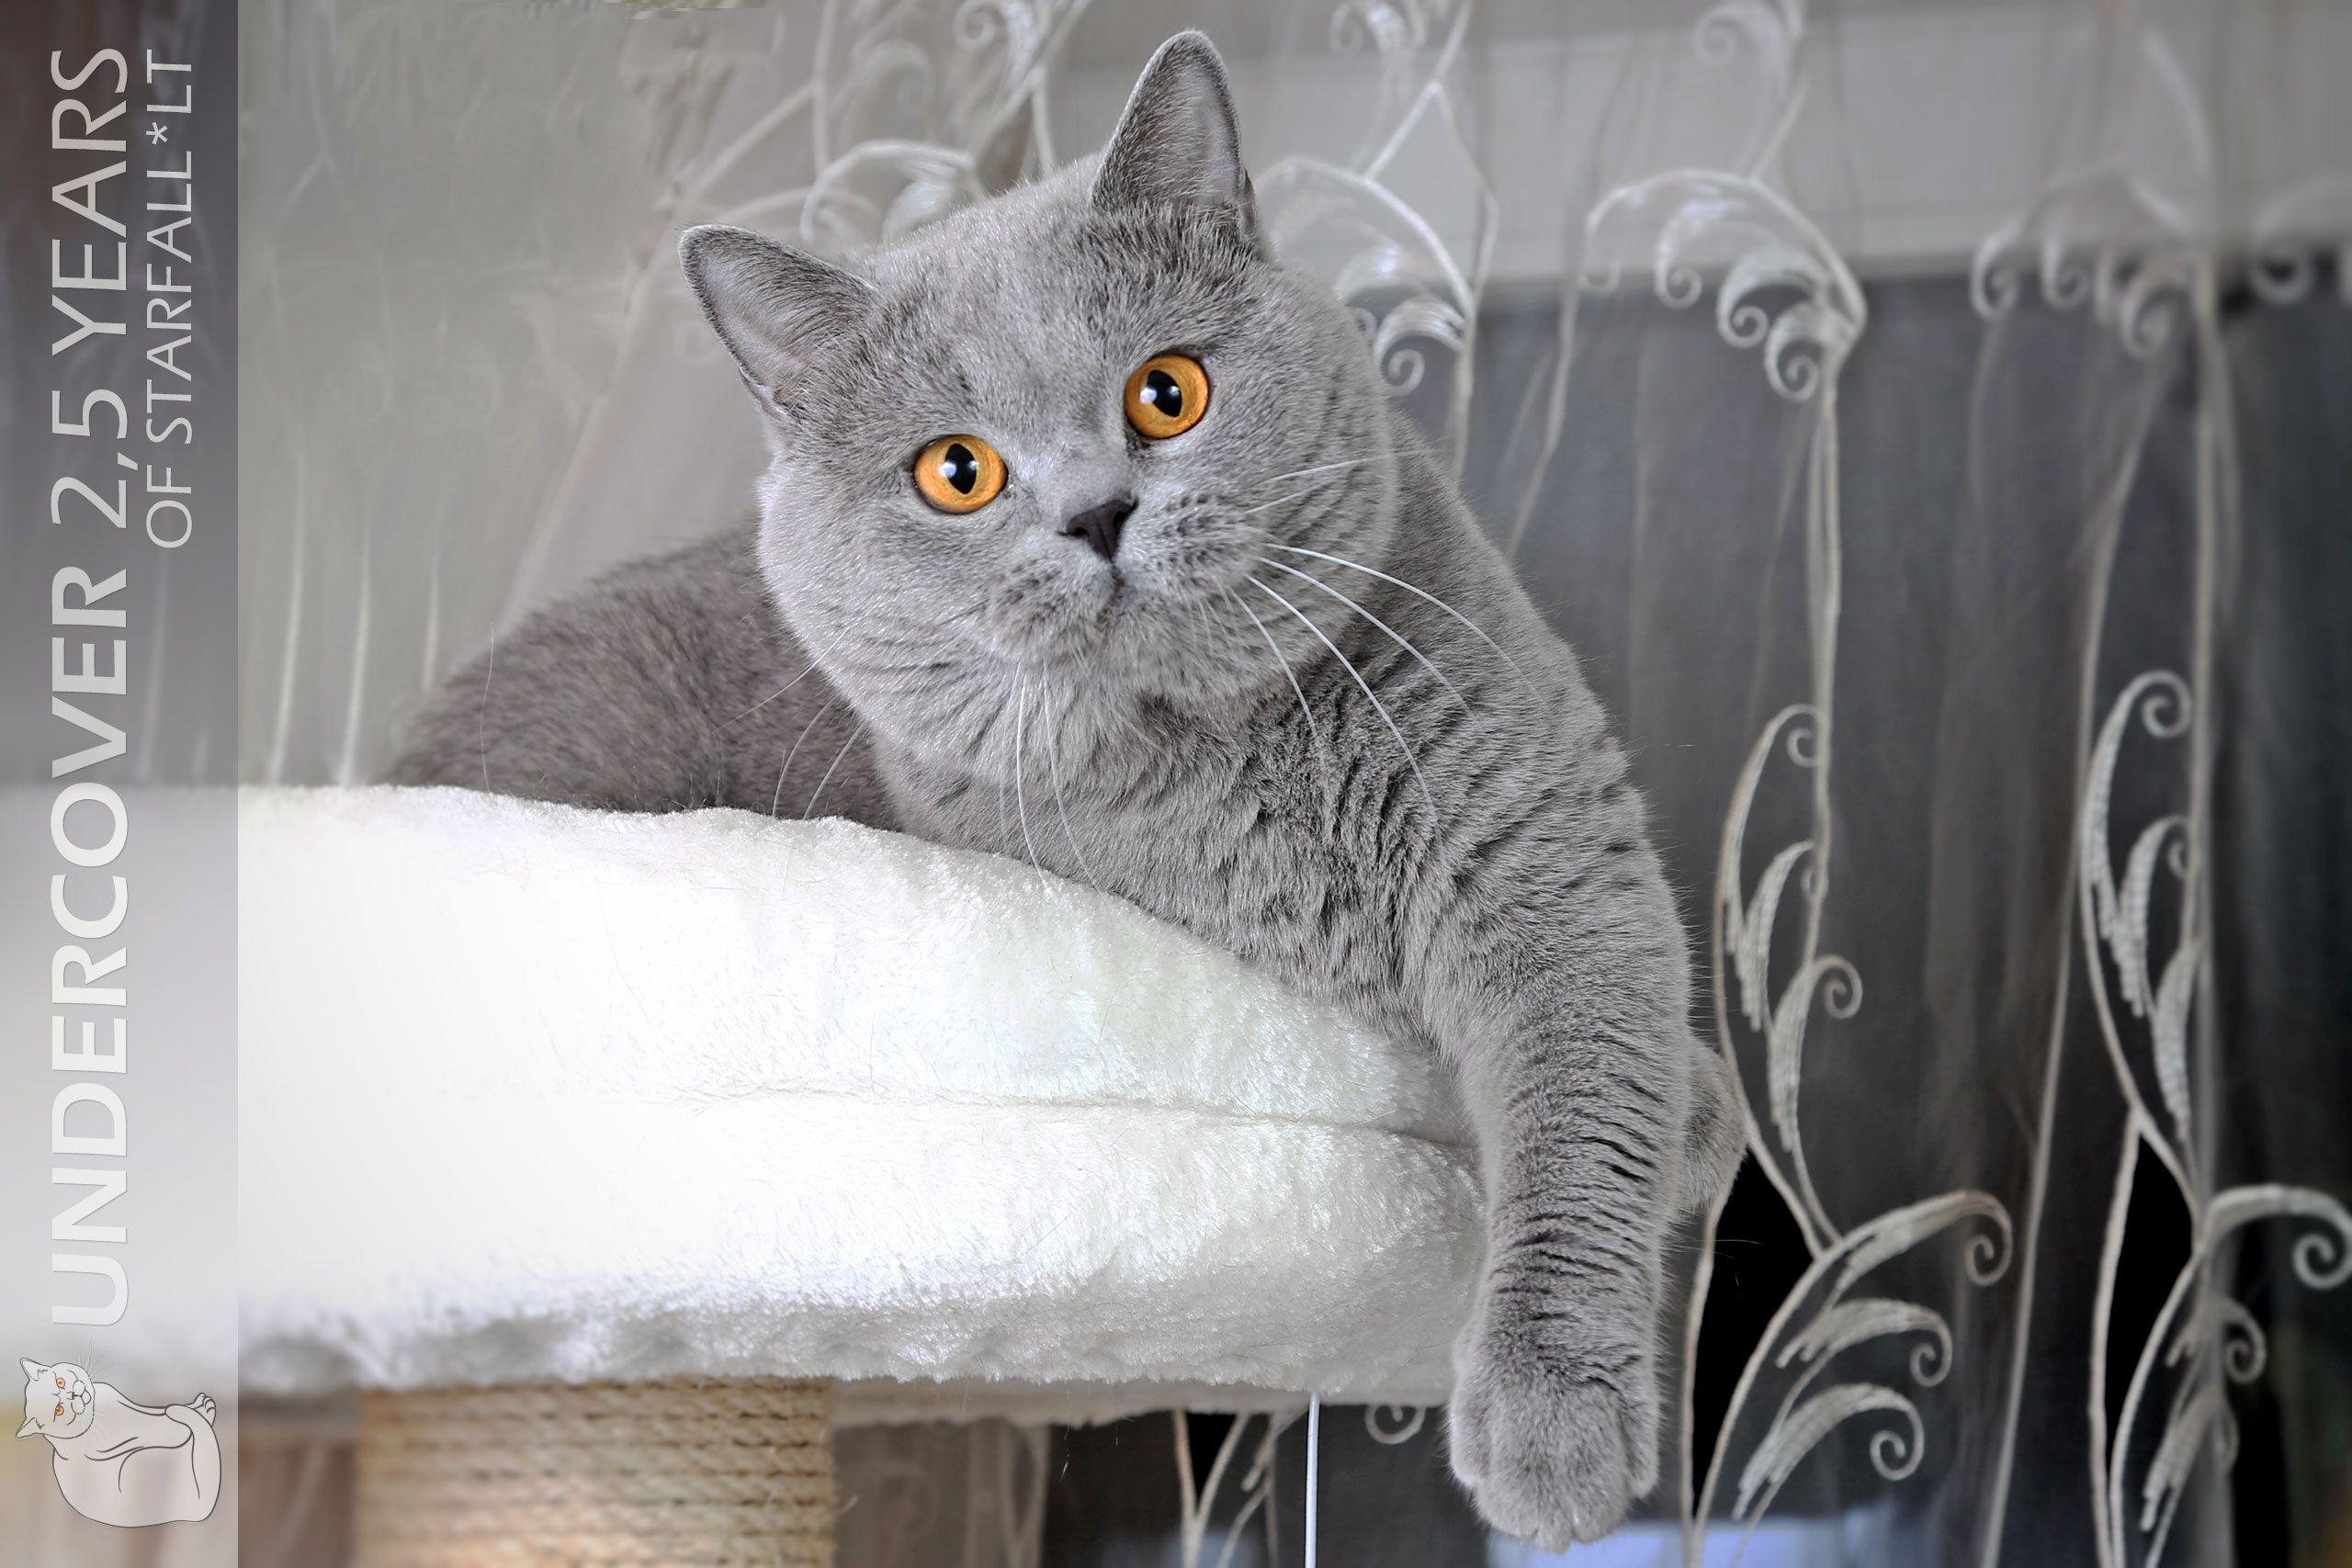 British Shorthair cattery Starfall*LT https//starfall.lt